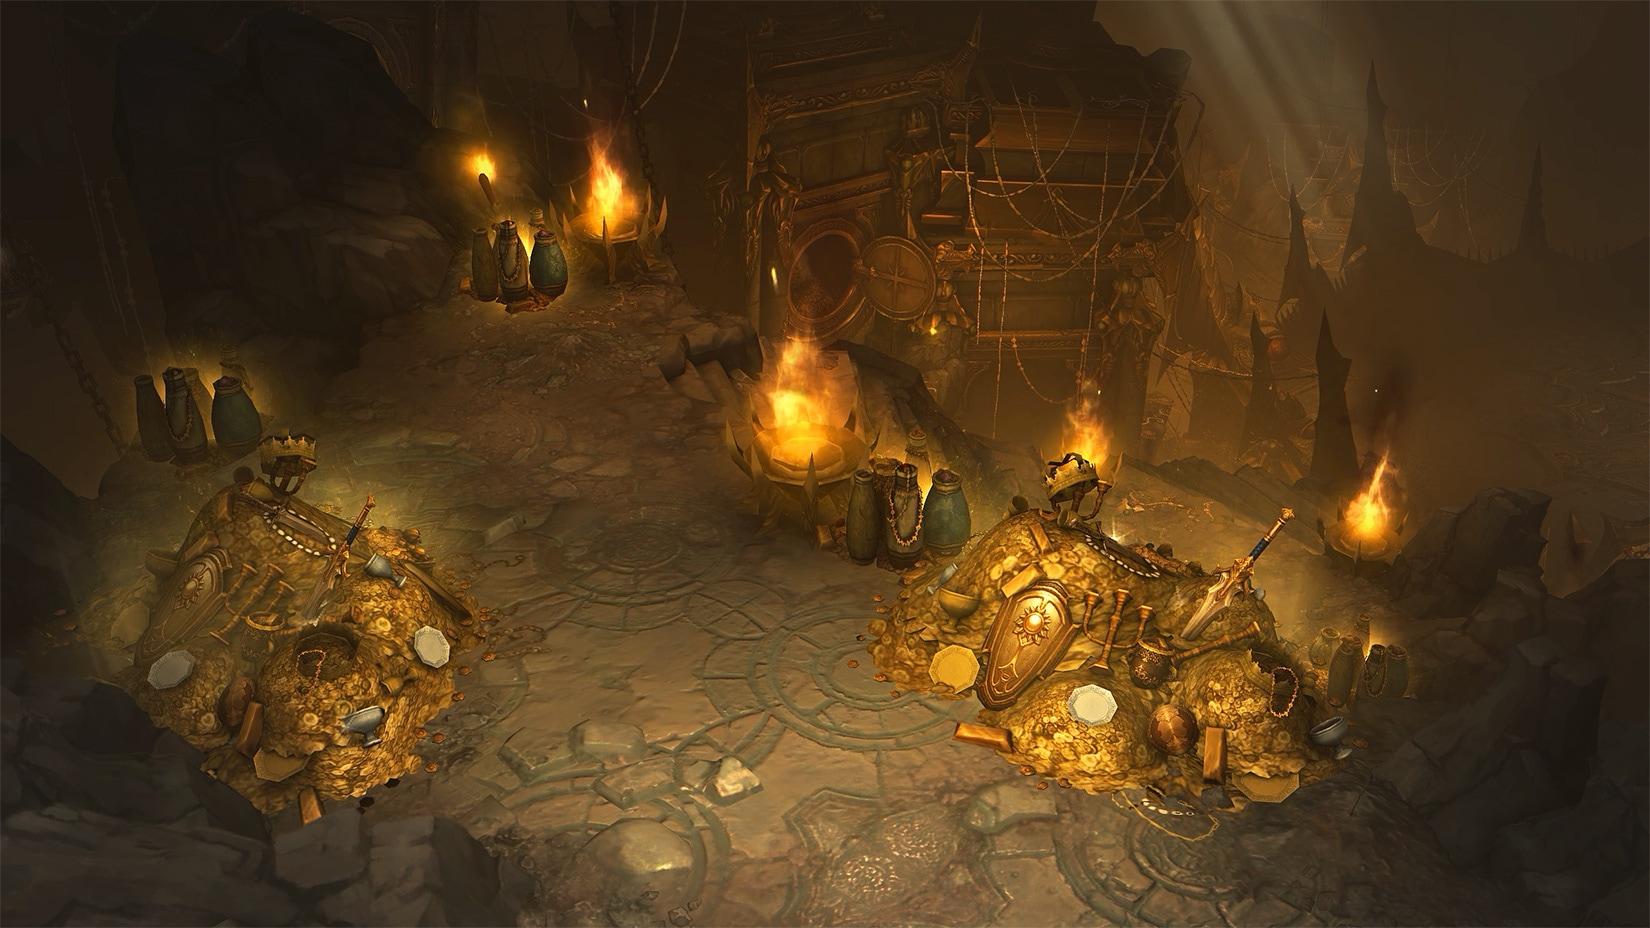 Whee-hee! Loot Goblin amiibo Now Available - Diablo III